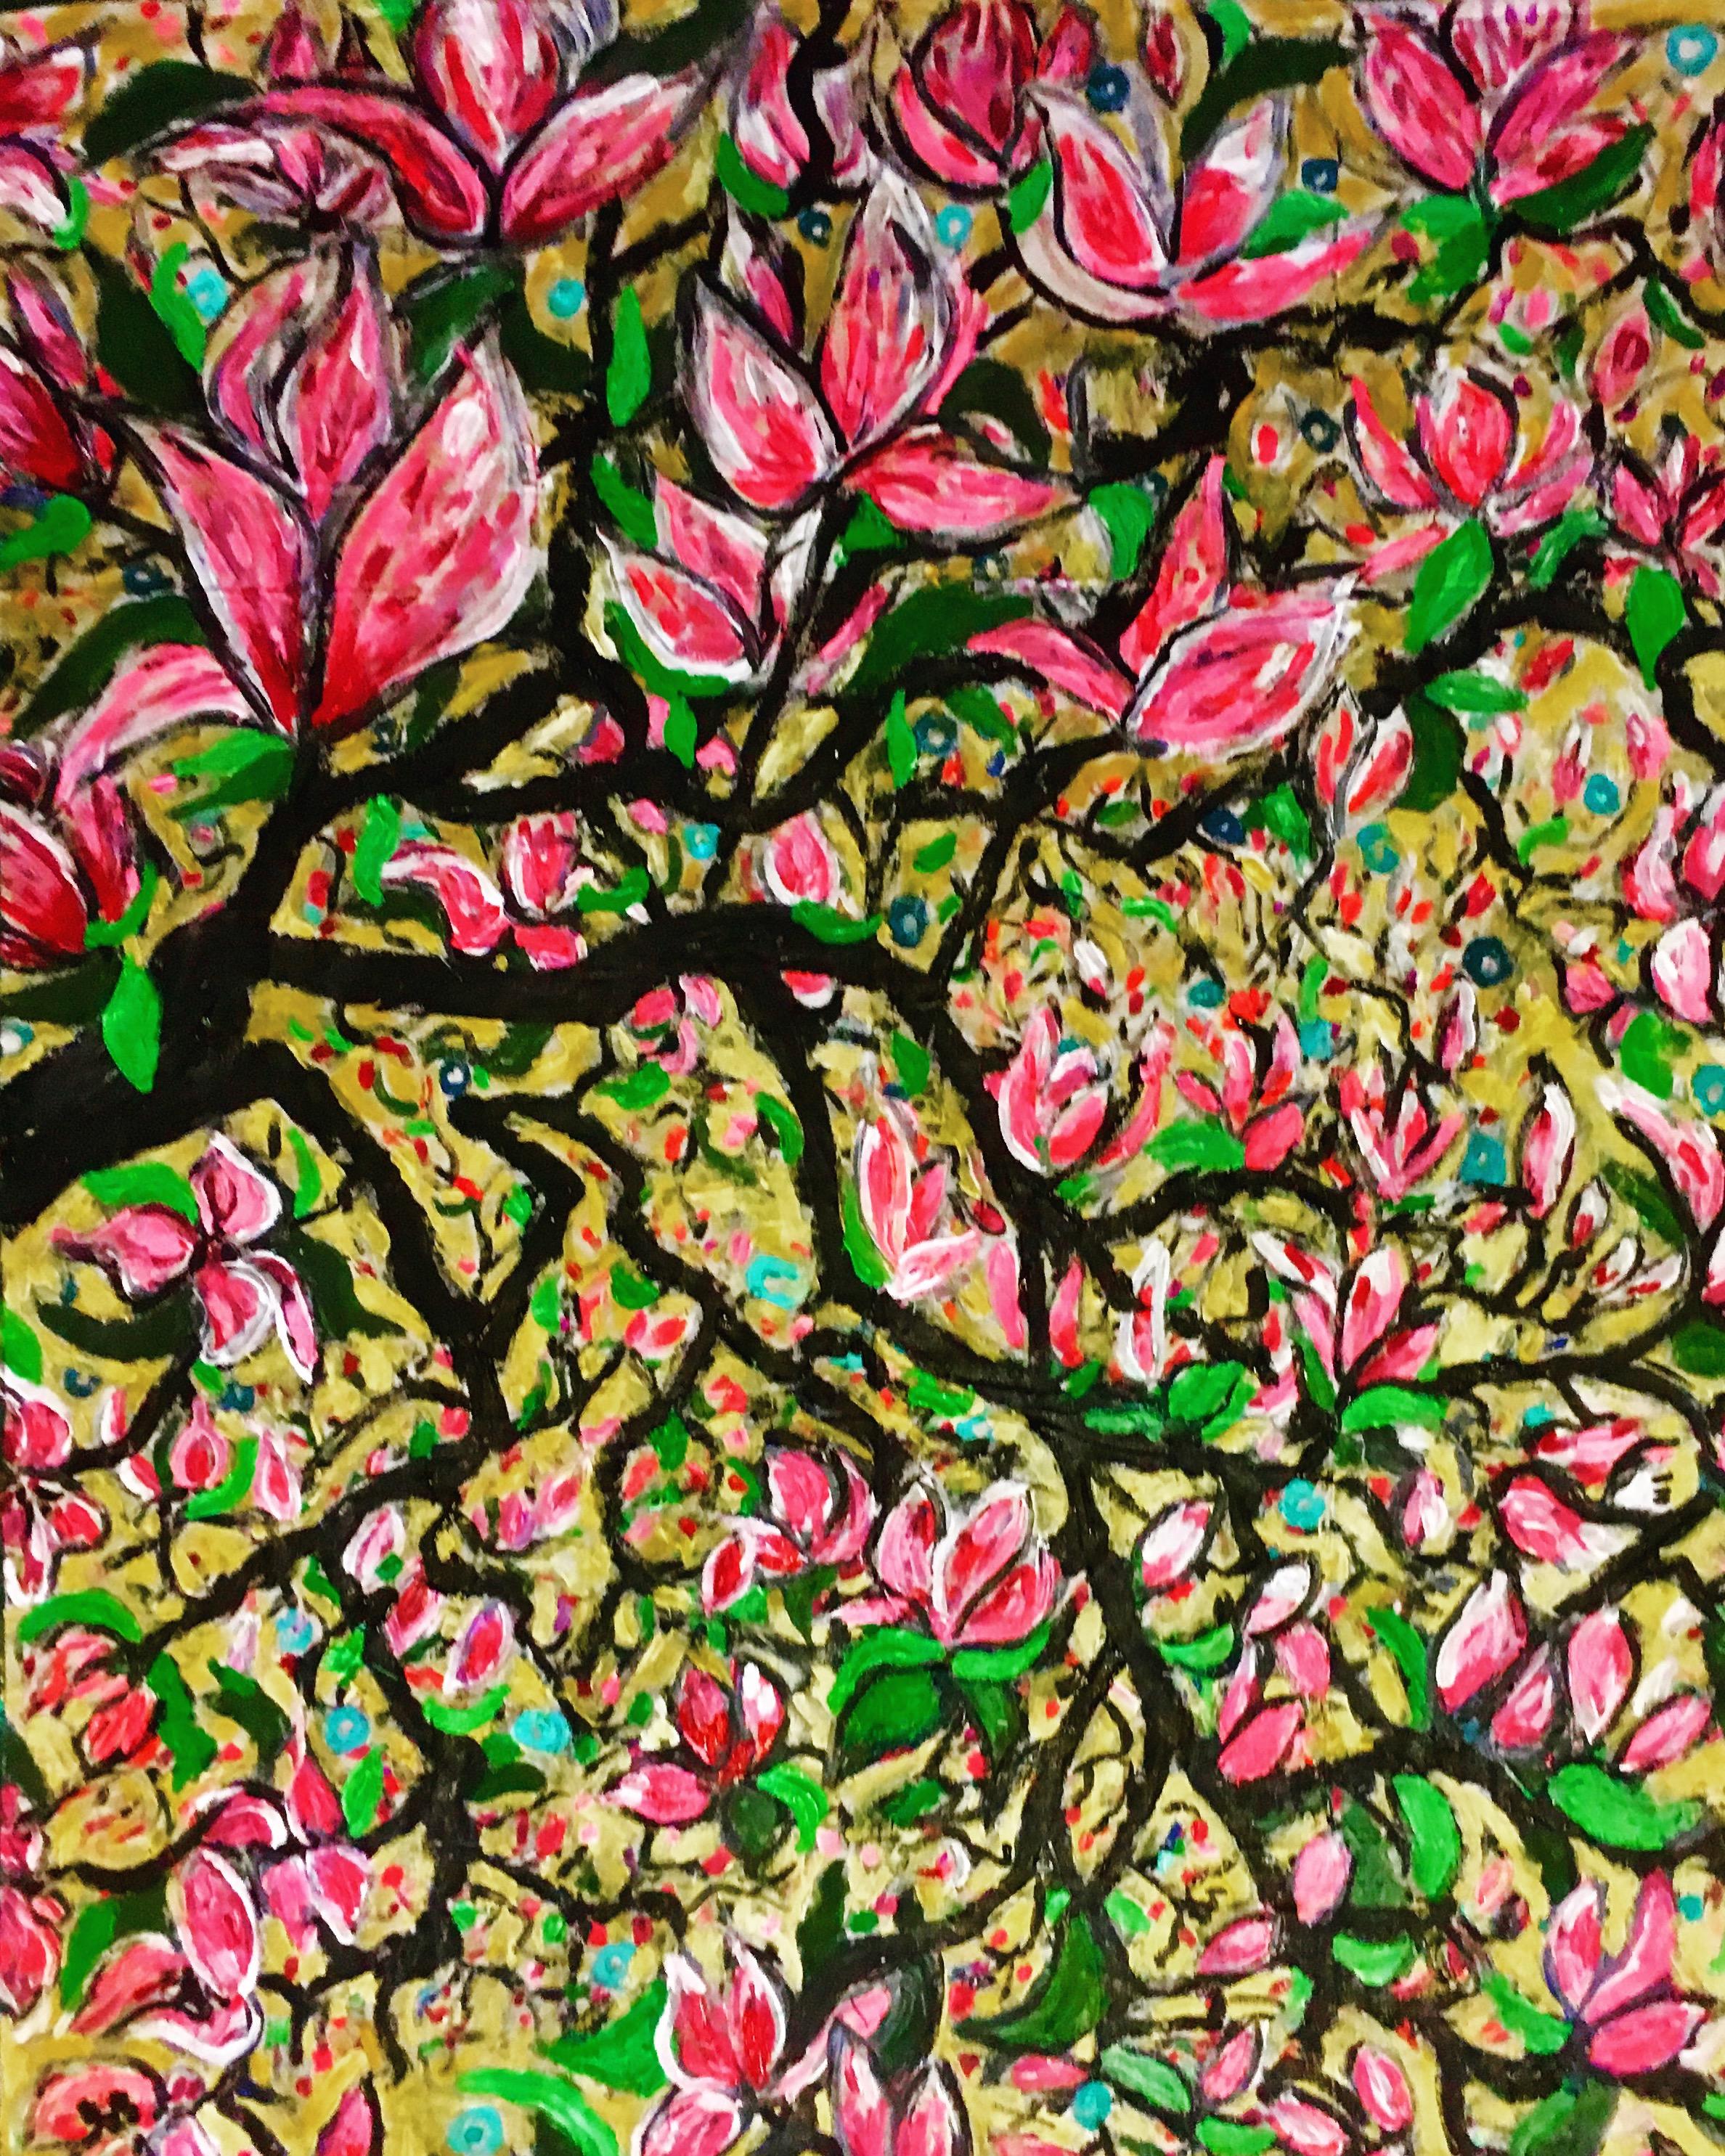 Magnolia Tree (Opening)